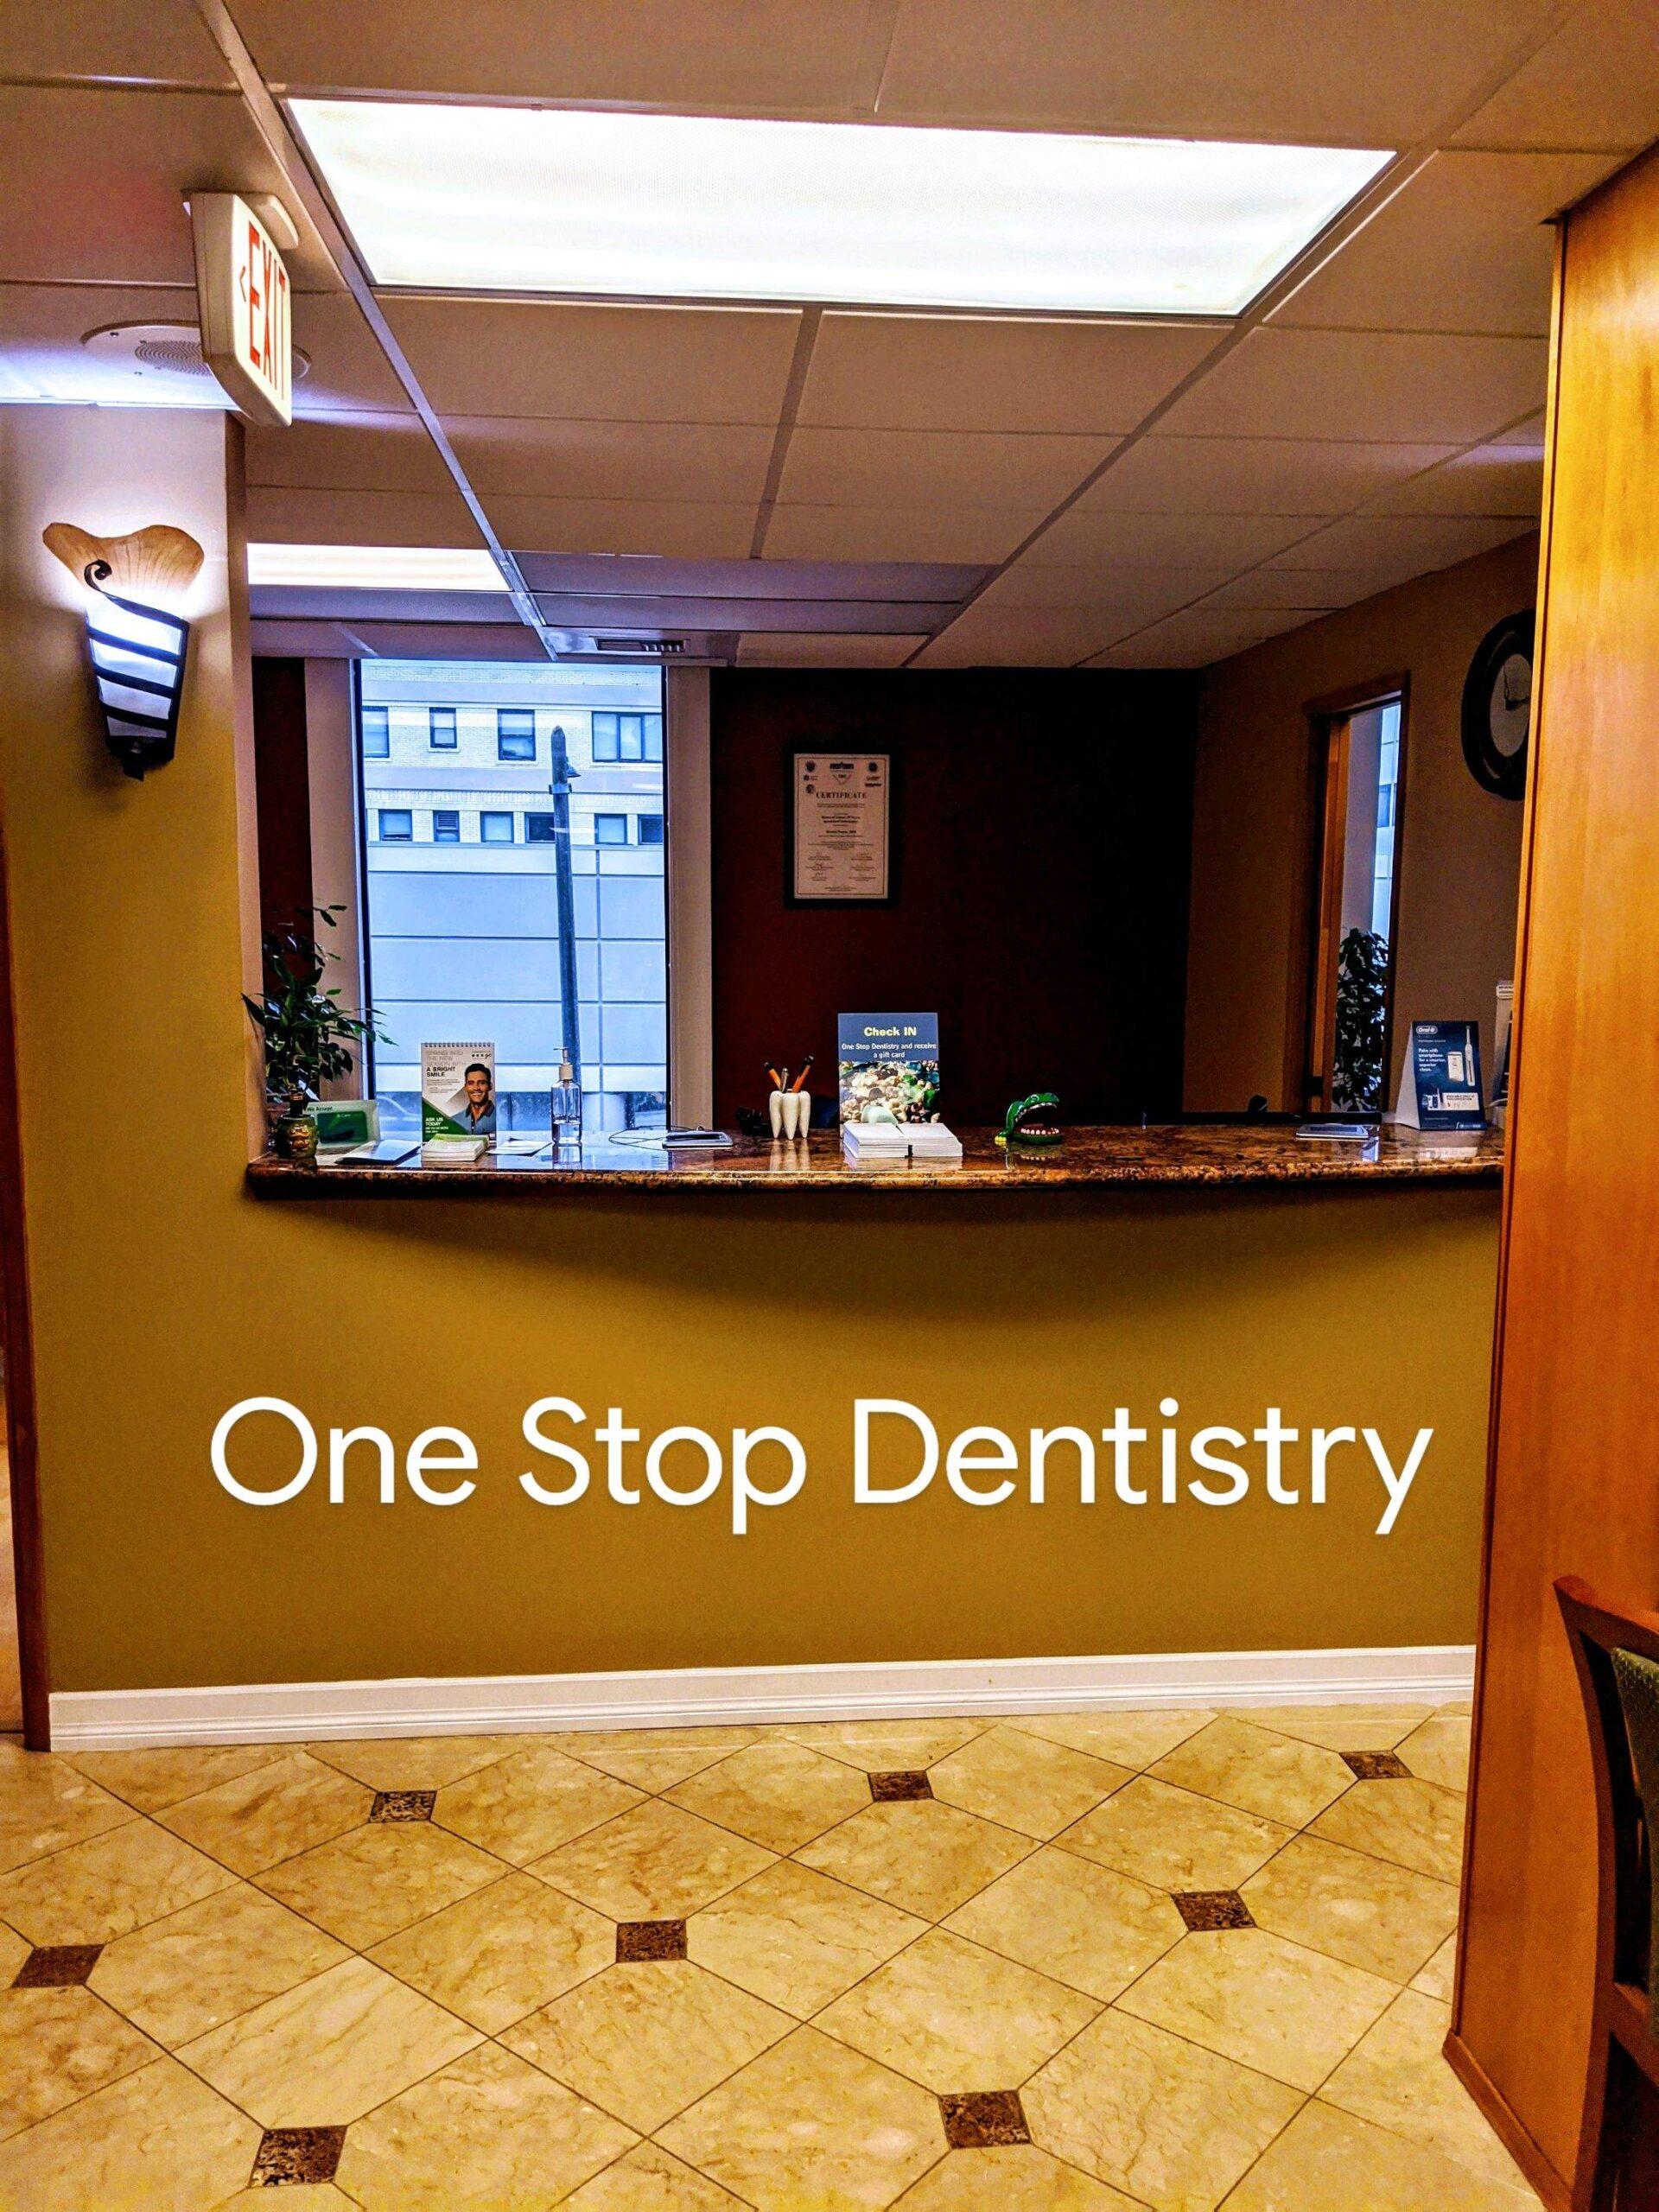 One stop dentistry reception desk